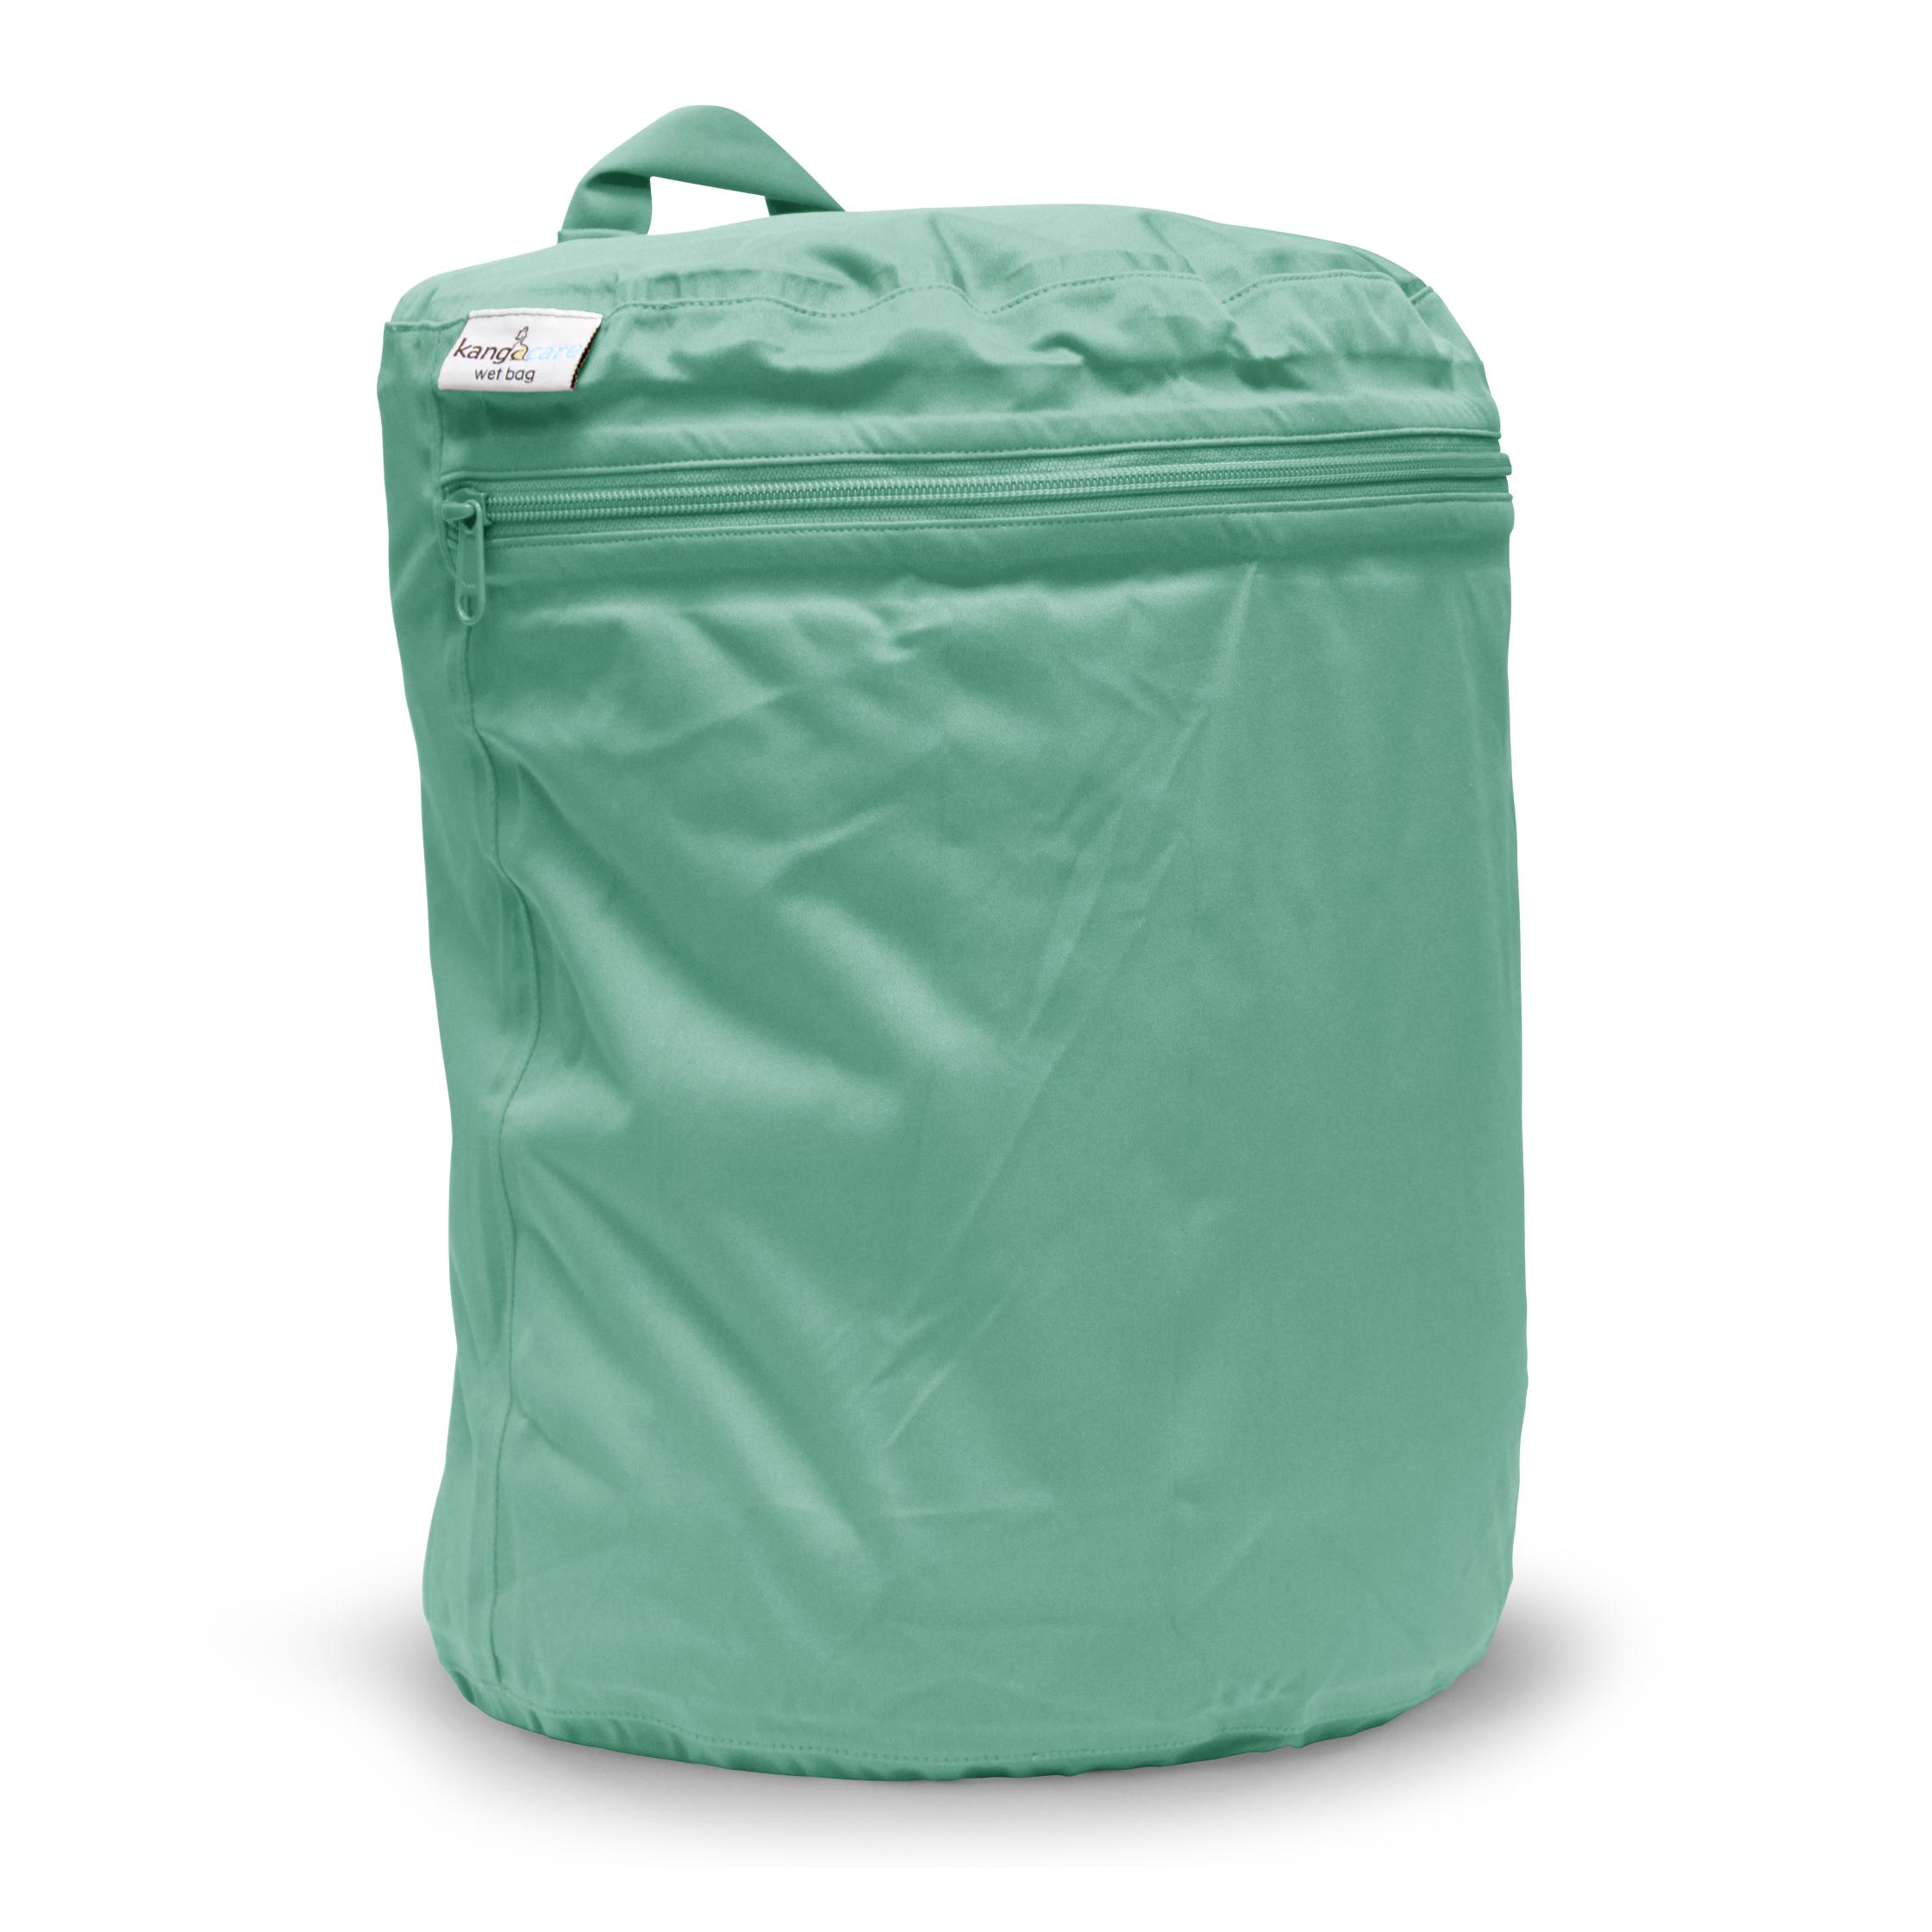 1f47a70e6 Kanga Care Wet Bag - Lagoon Baby - Maple Ridge BC Canada